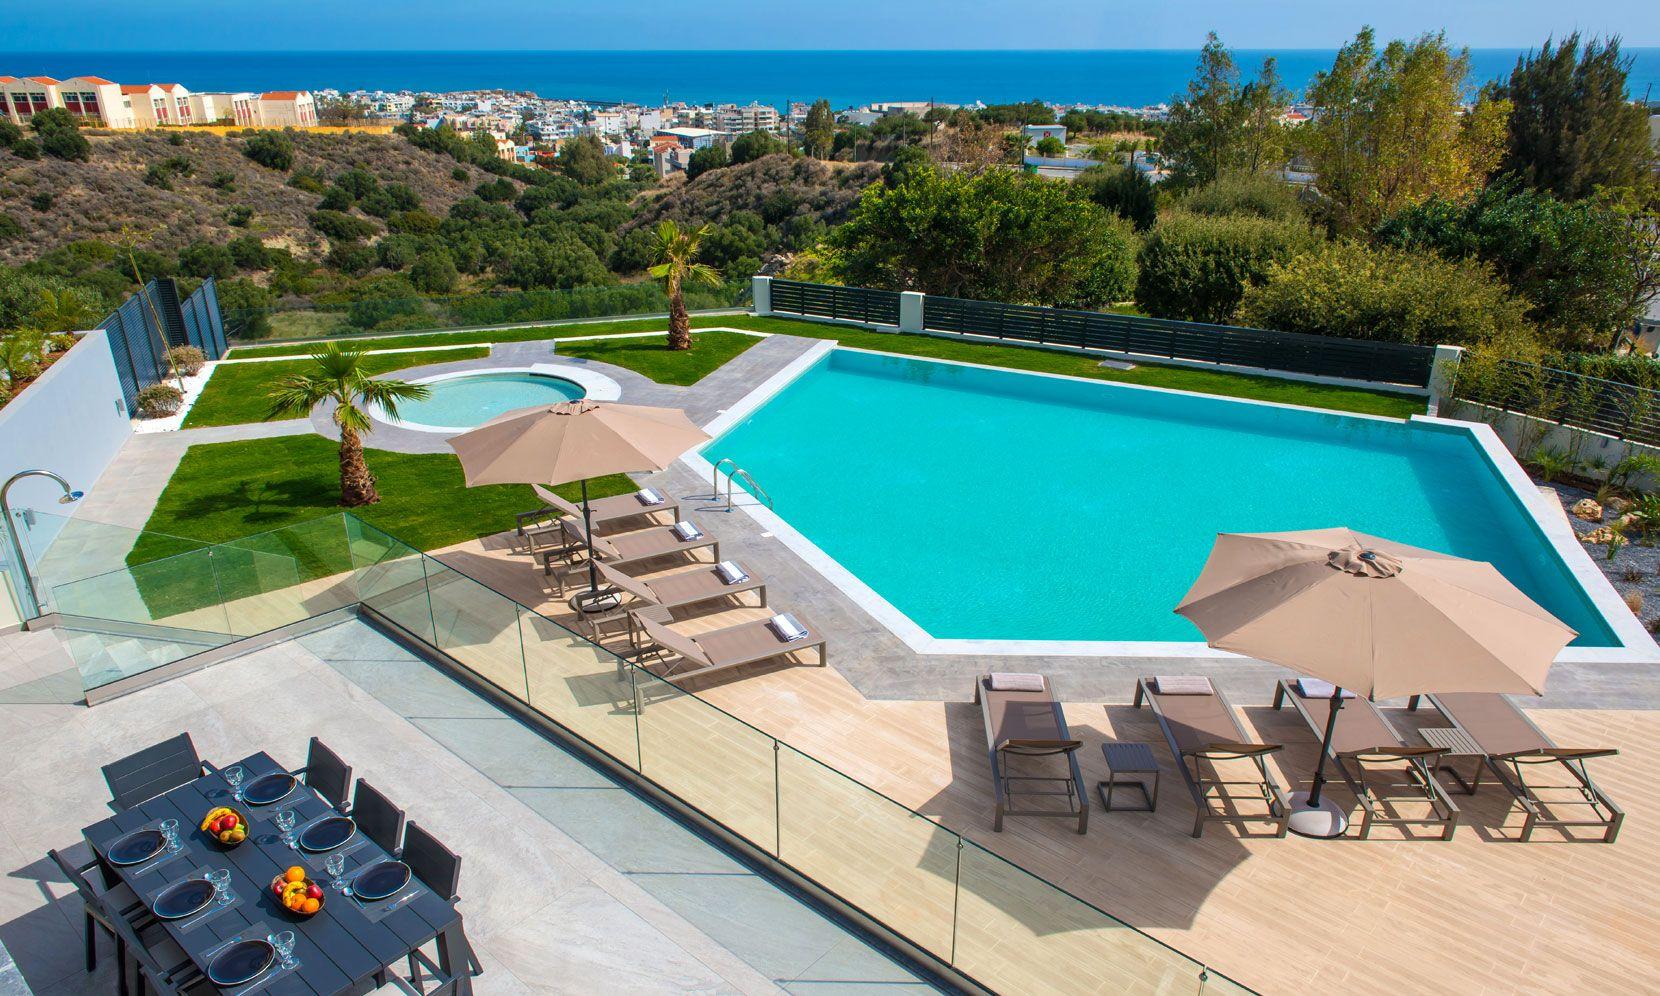 Crete Villa Medora jumbotron image